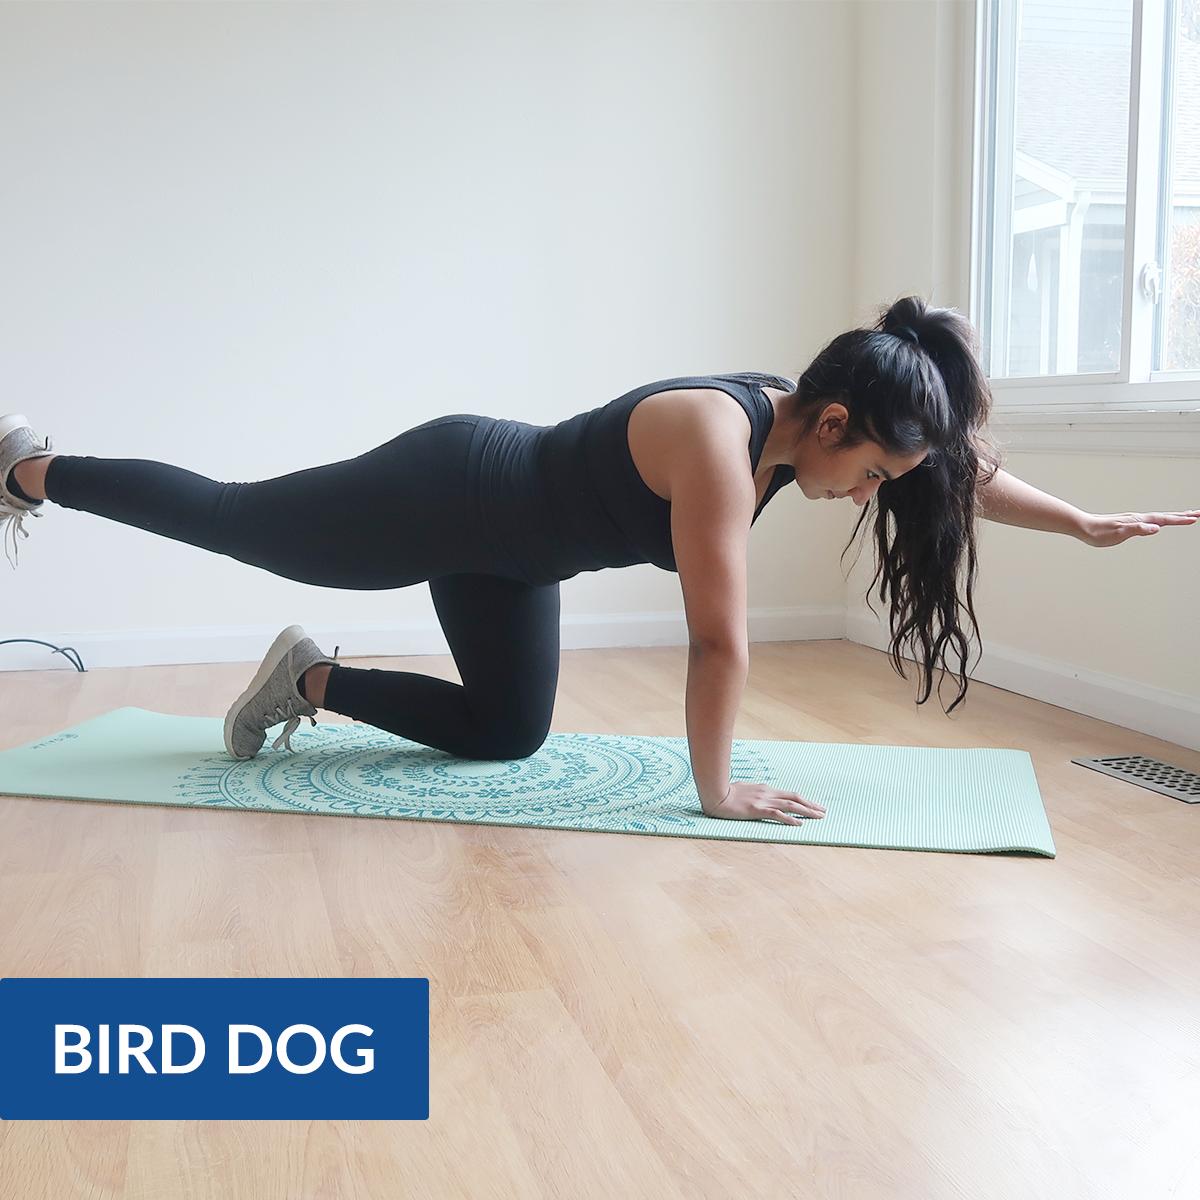 bird dog pose